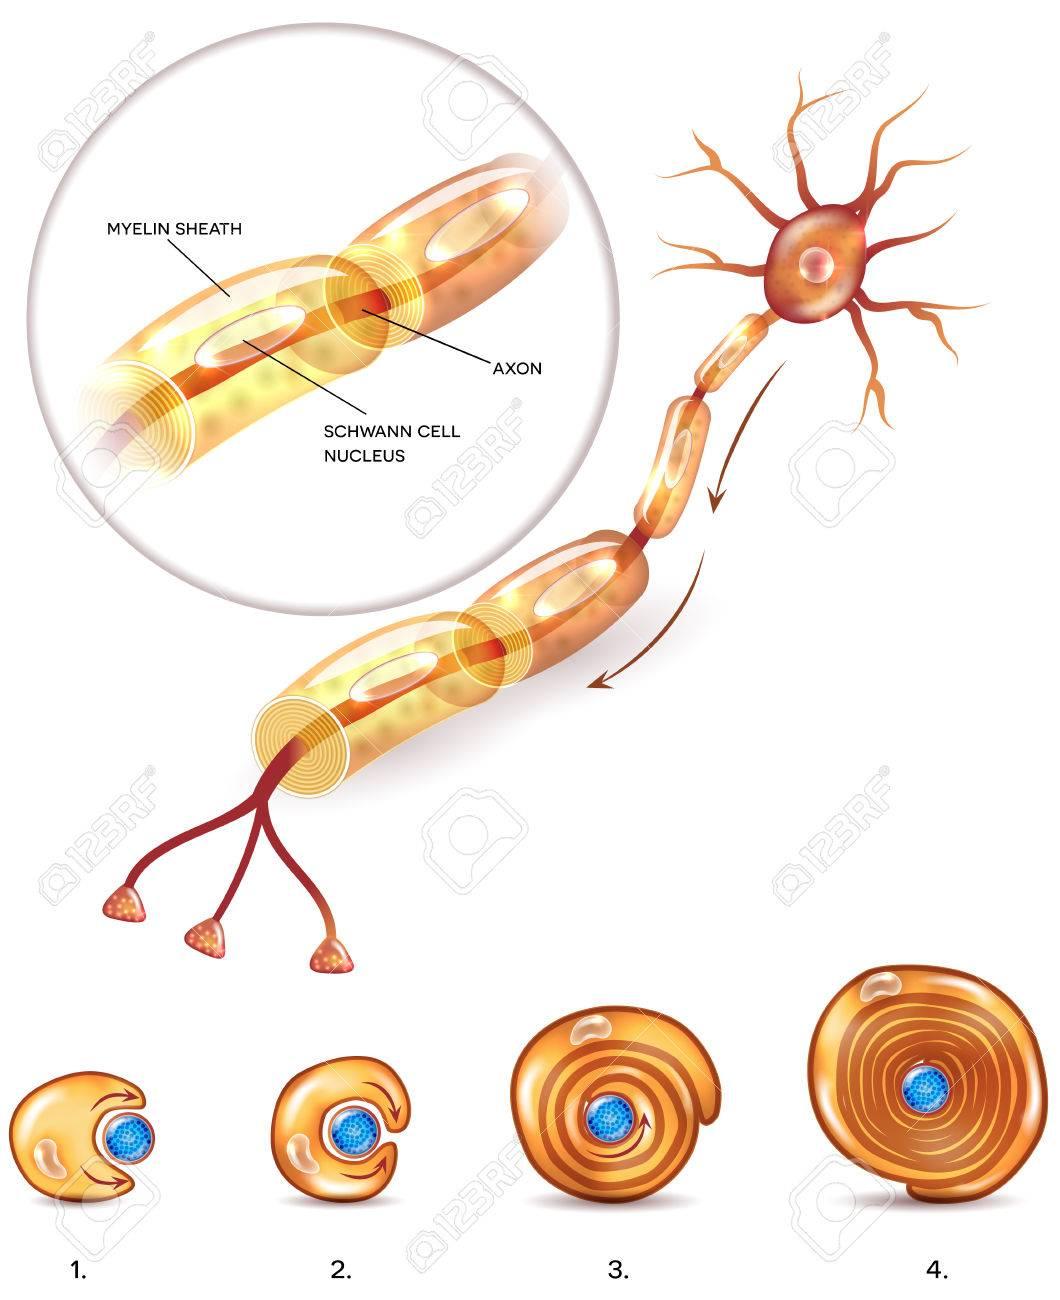 Neuron anatomy 3d illustration close up and myelin sheath formation around axon - 83768178